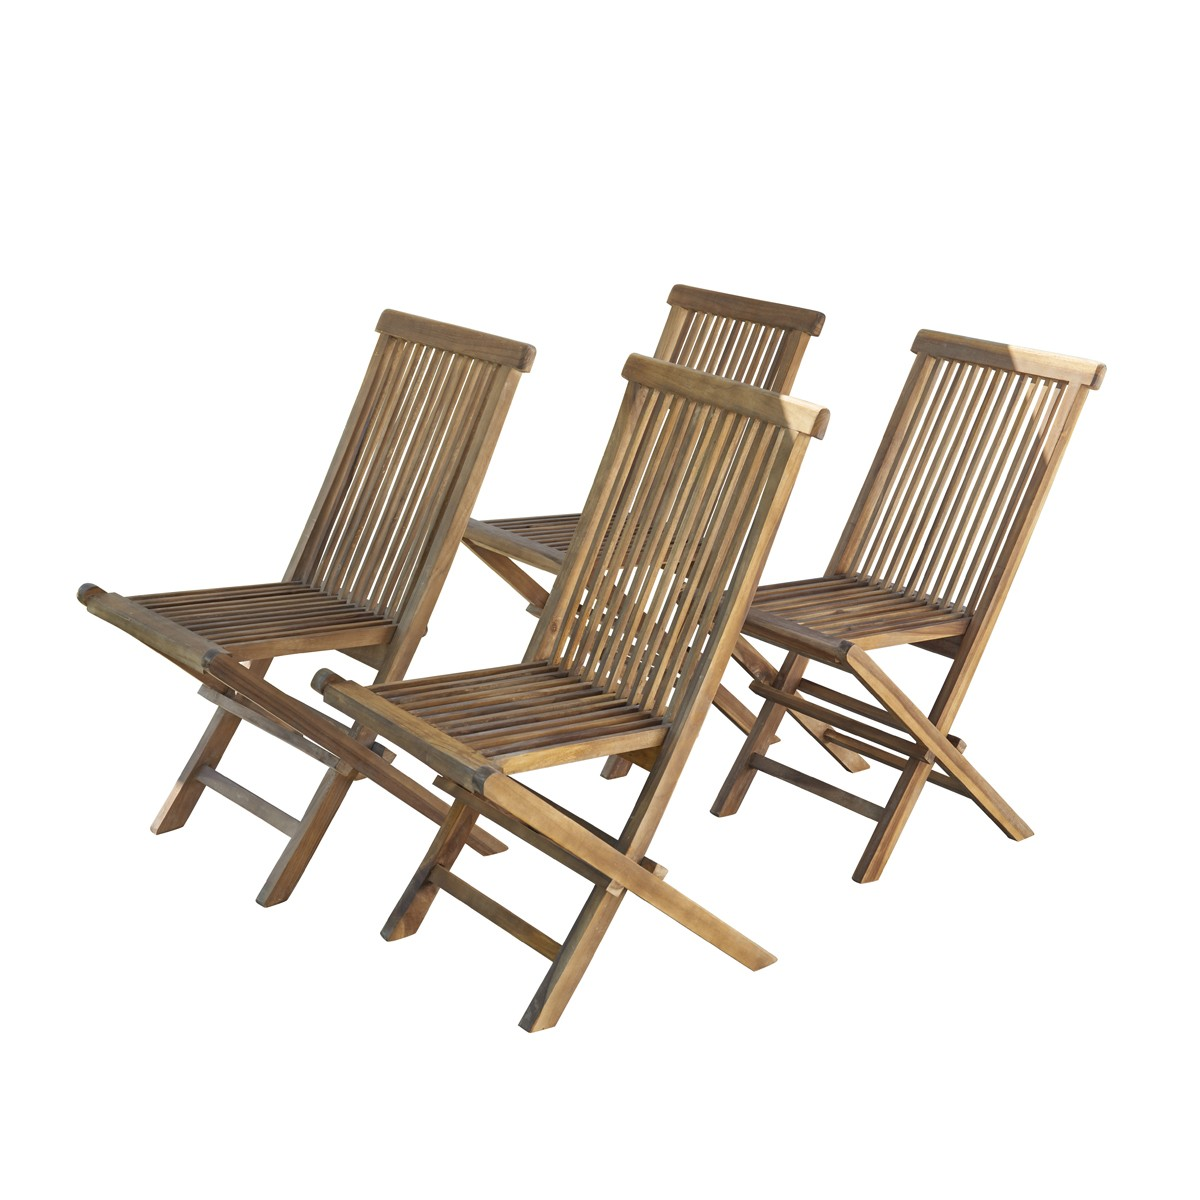 Chaise de jardin en teck huilé pliante (lot de 4)